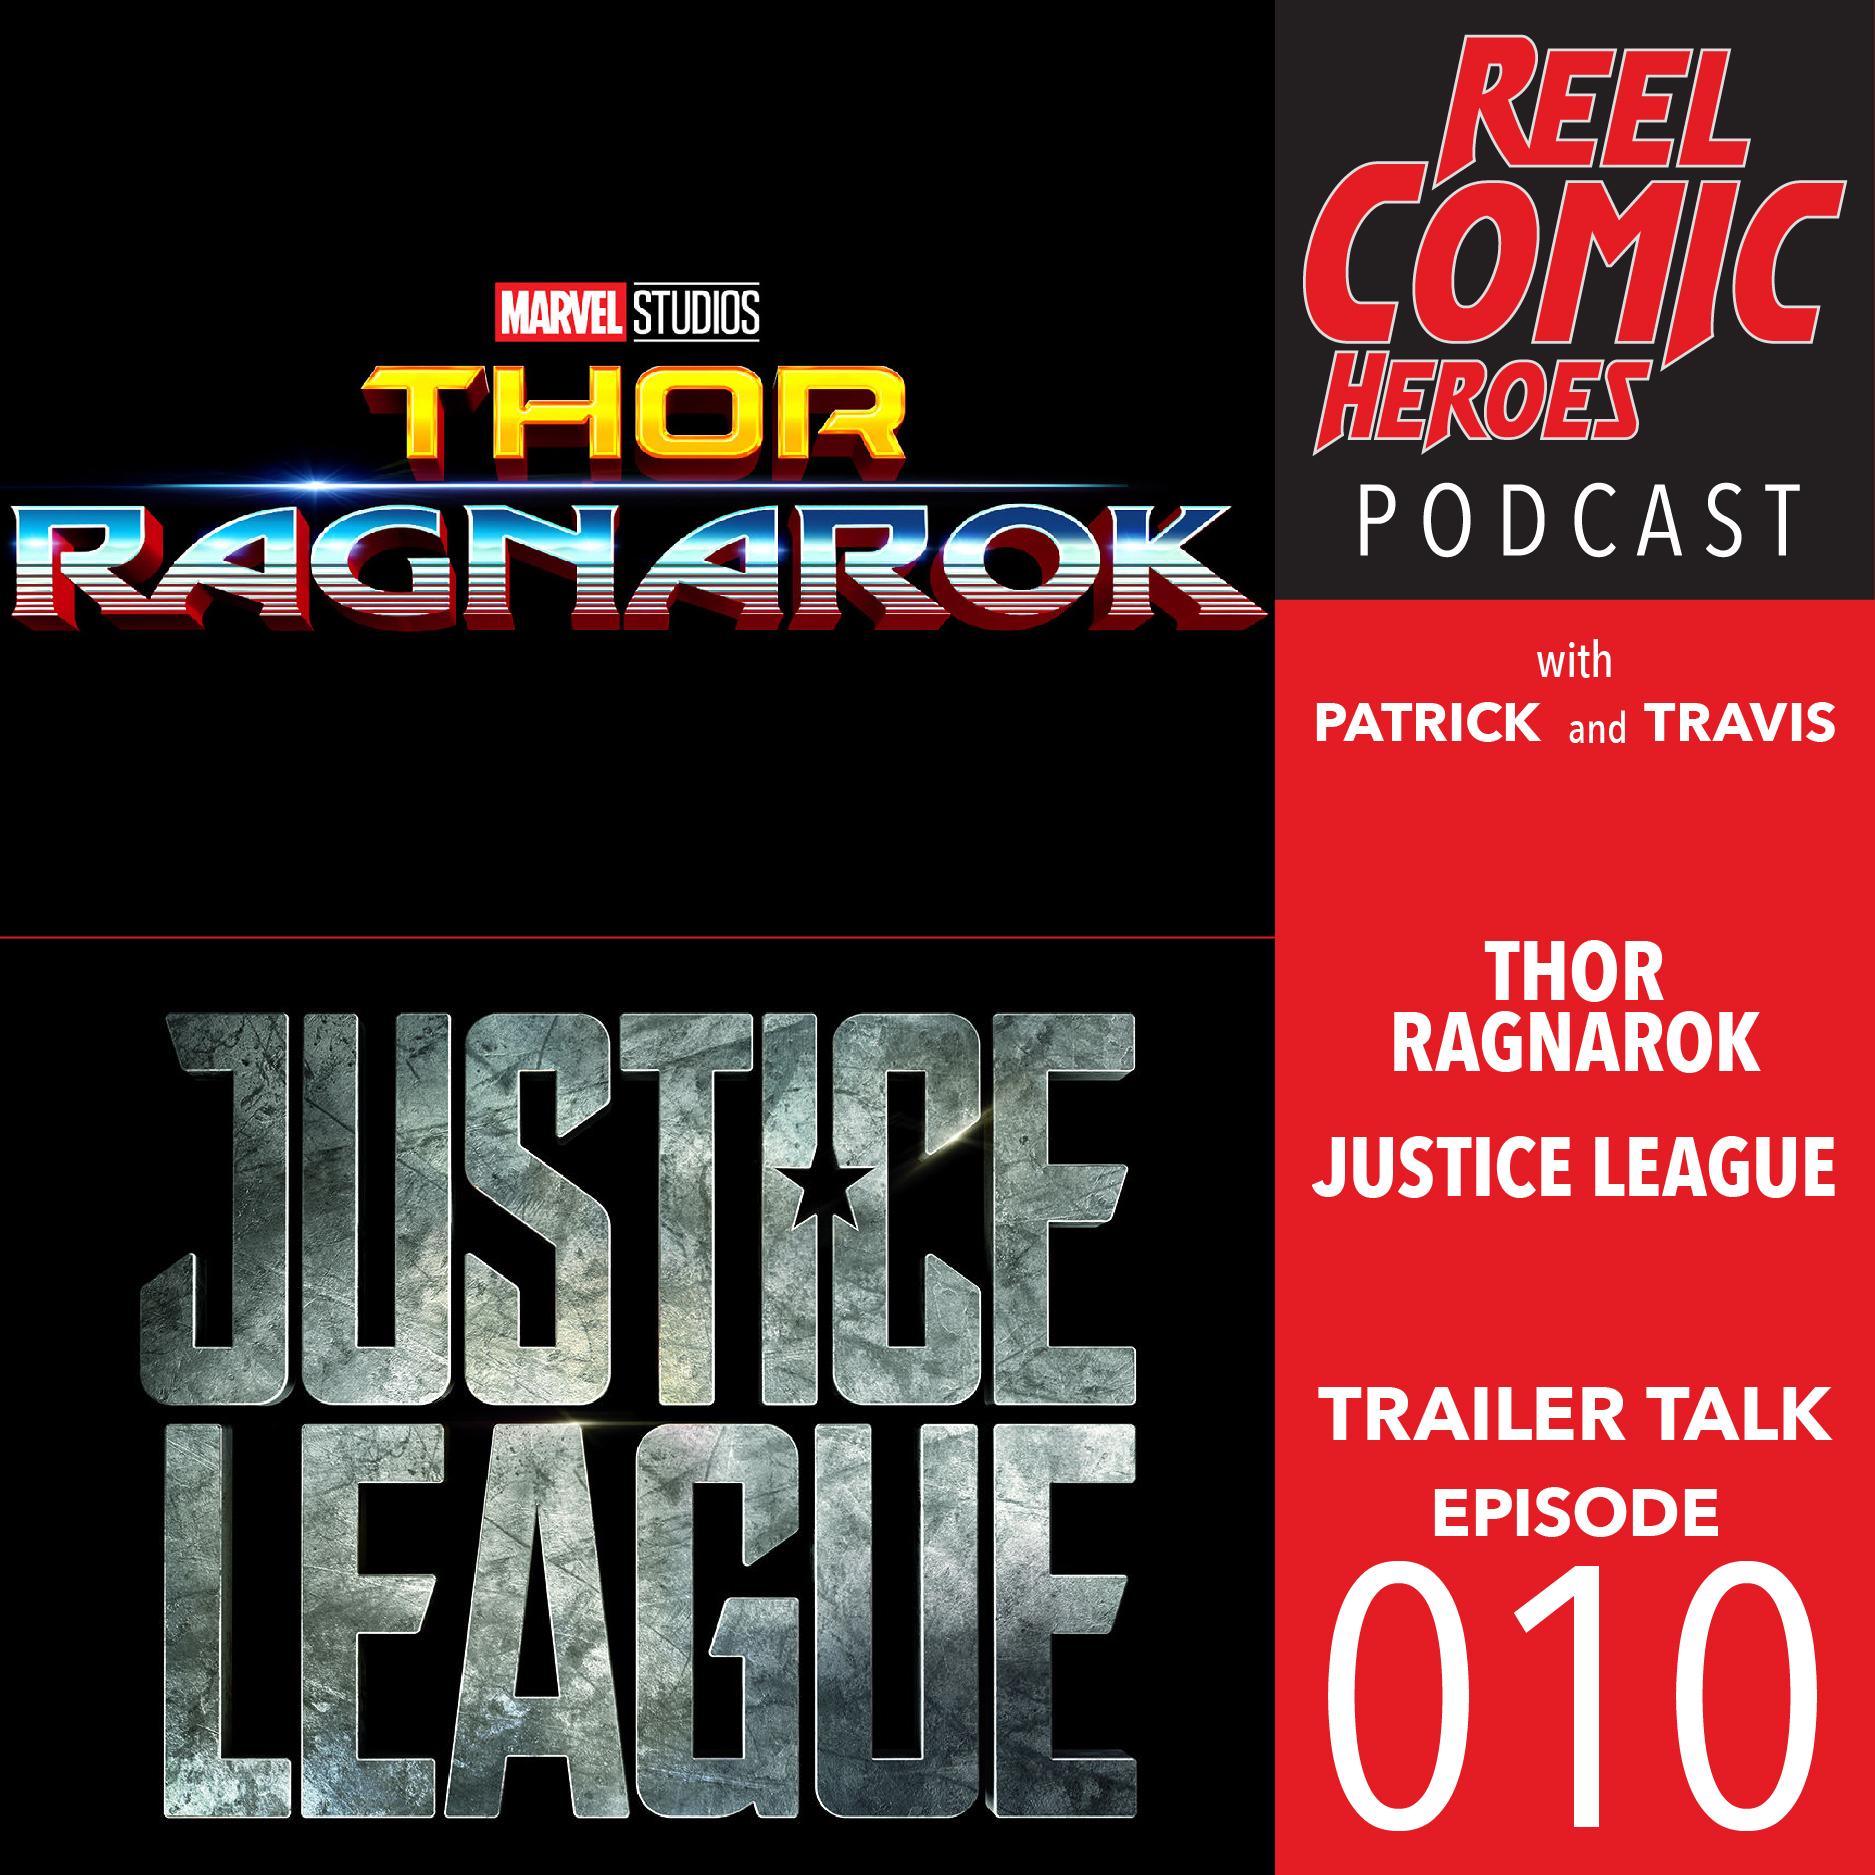 Artwork for Reel Comic Heroes - Trailer Talk 010